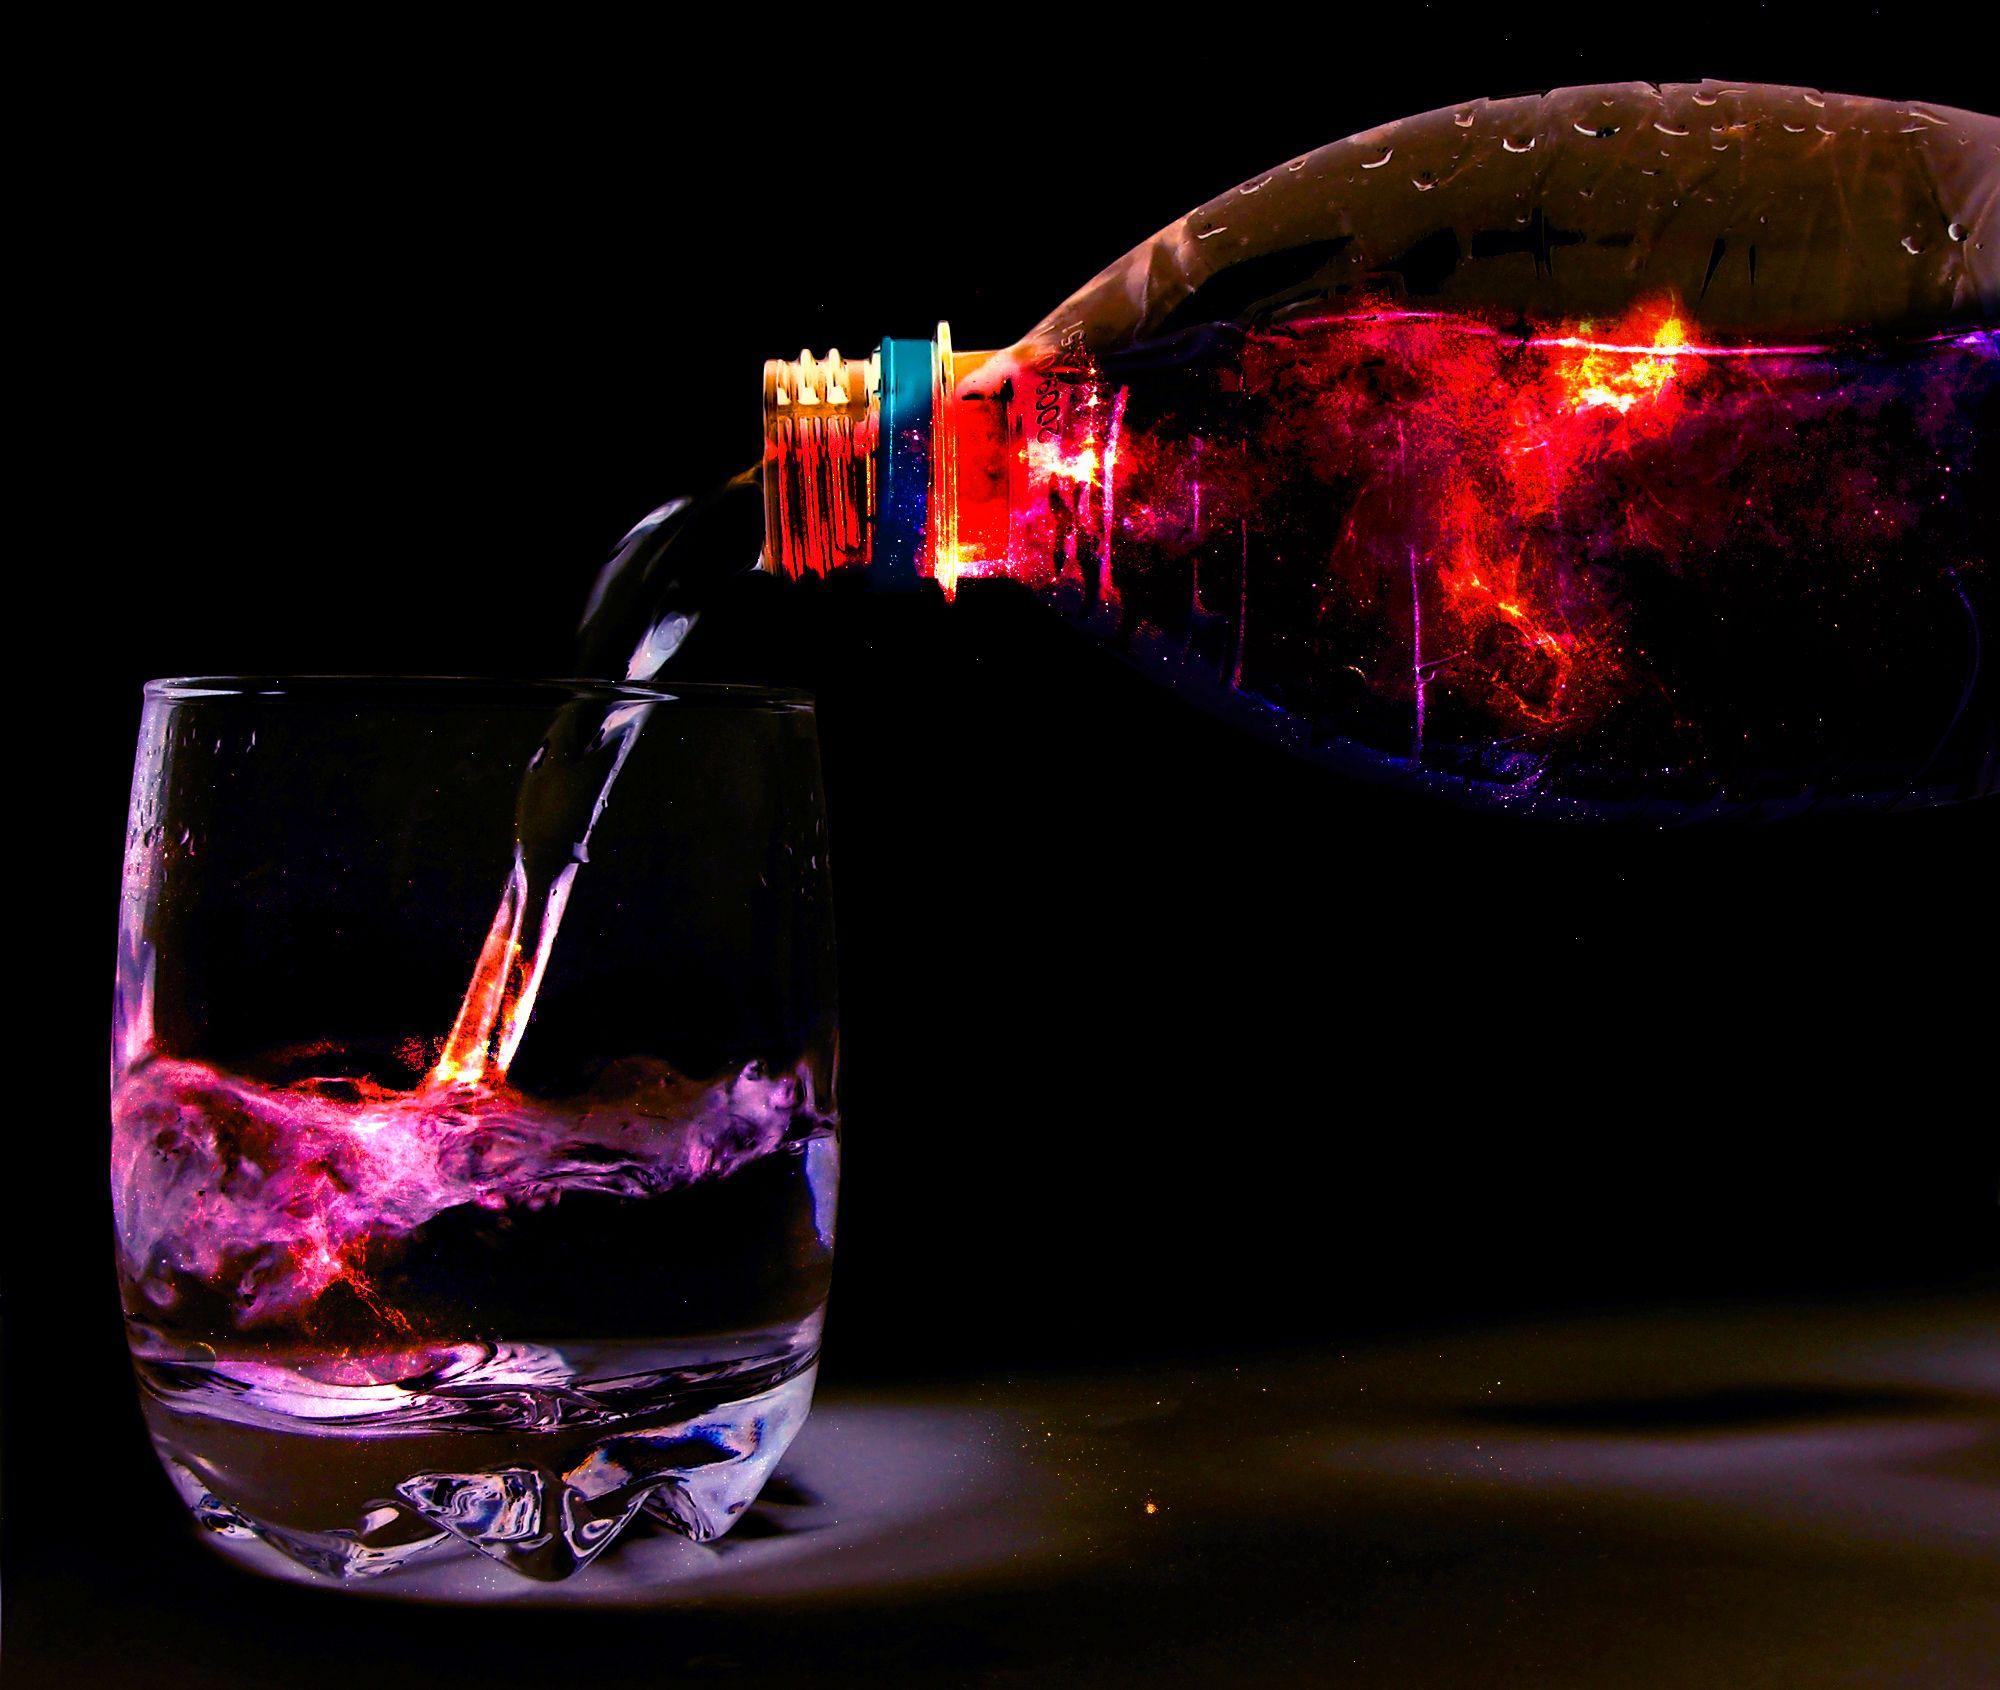 Water bottle & galaxy photo manipulation using Photoshop